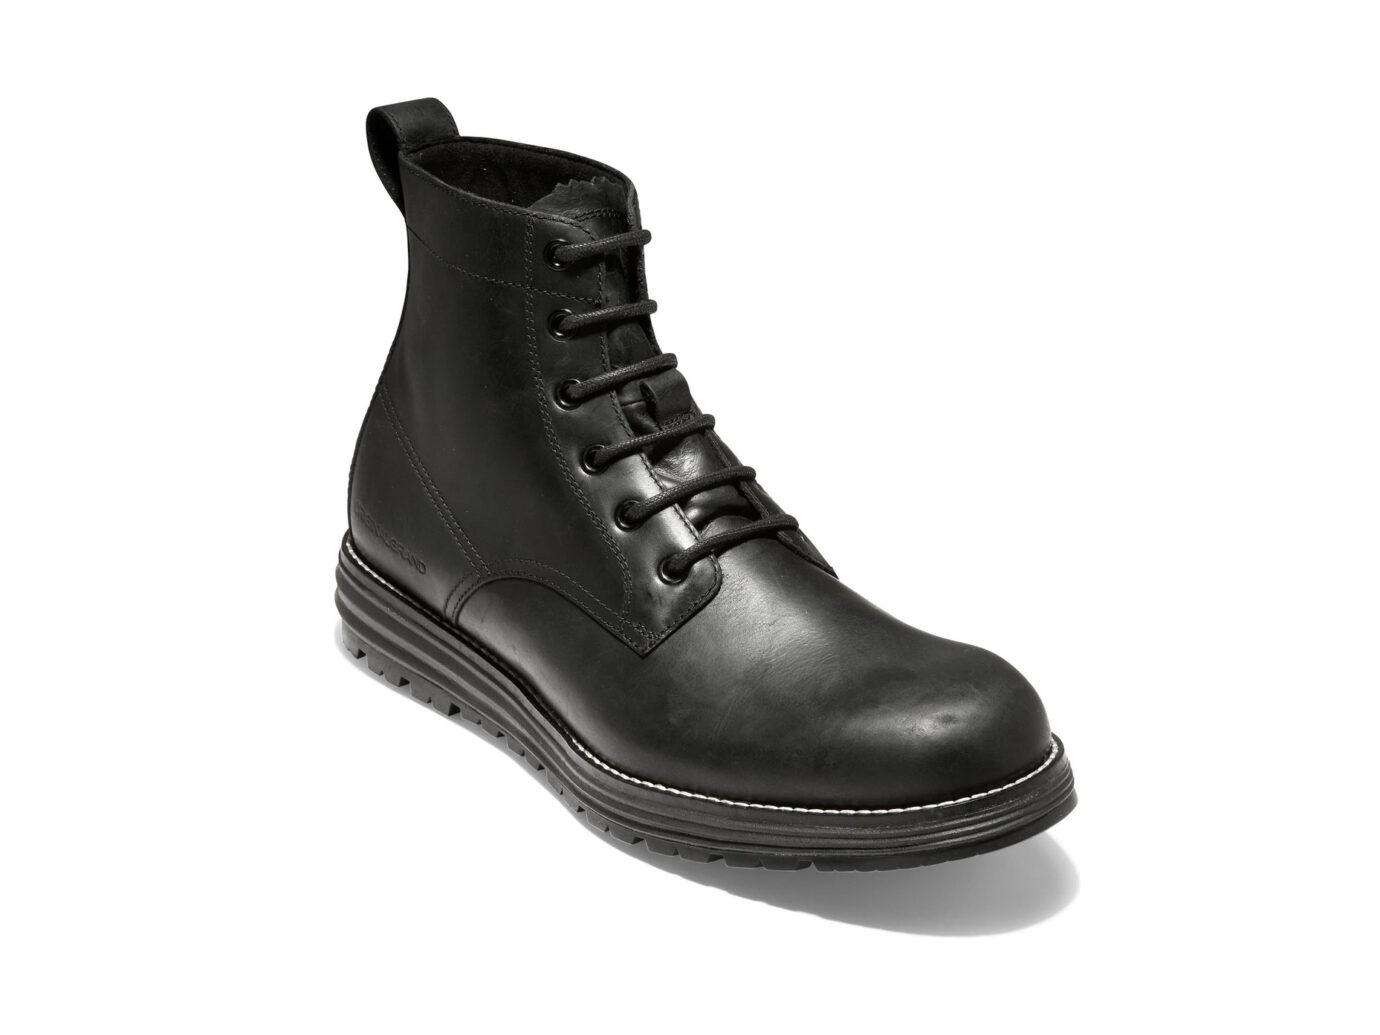 Cole Hann Original Grand Waterproof Plain Toe boots